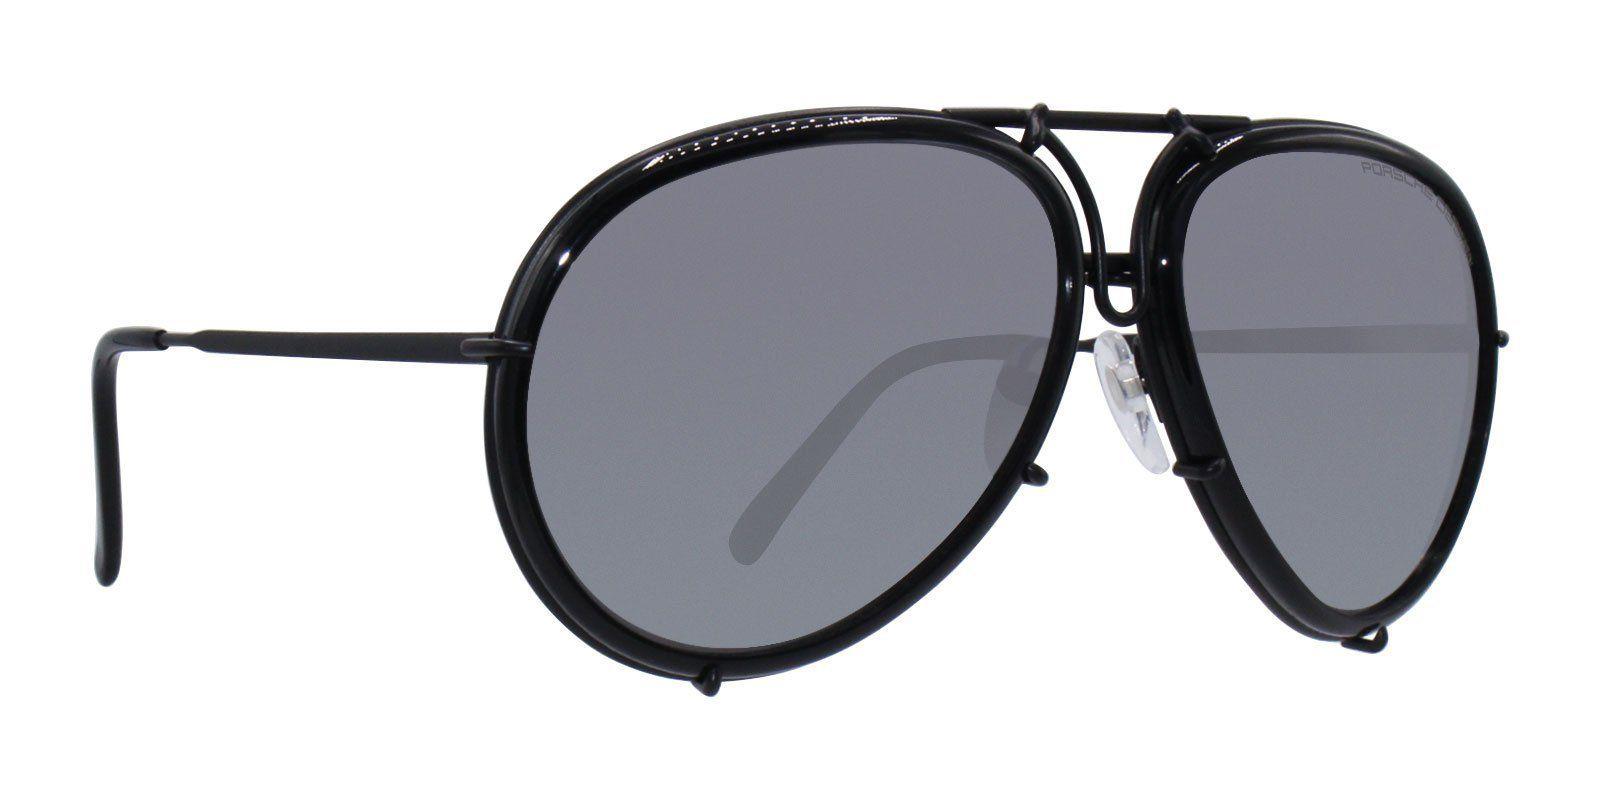 0642b85928d Porsche Design. Porsche Design - P8613 Black - Gray-sunglasses-Designer Eyes